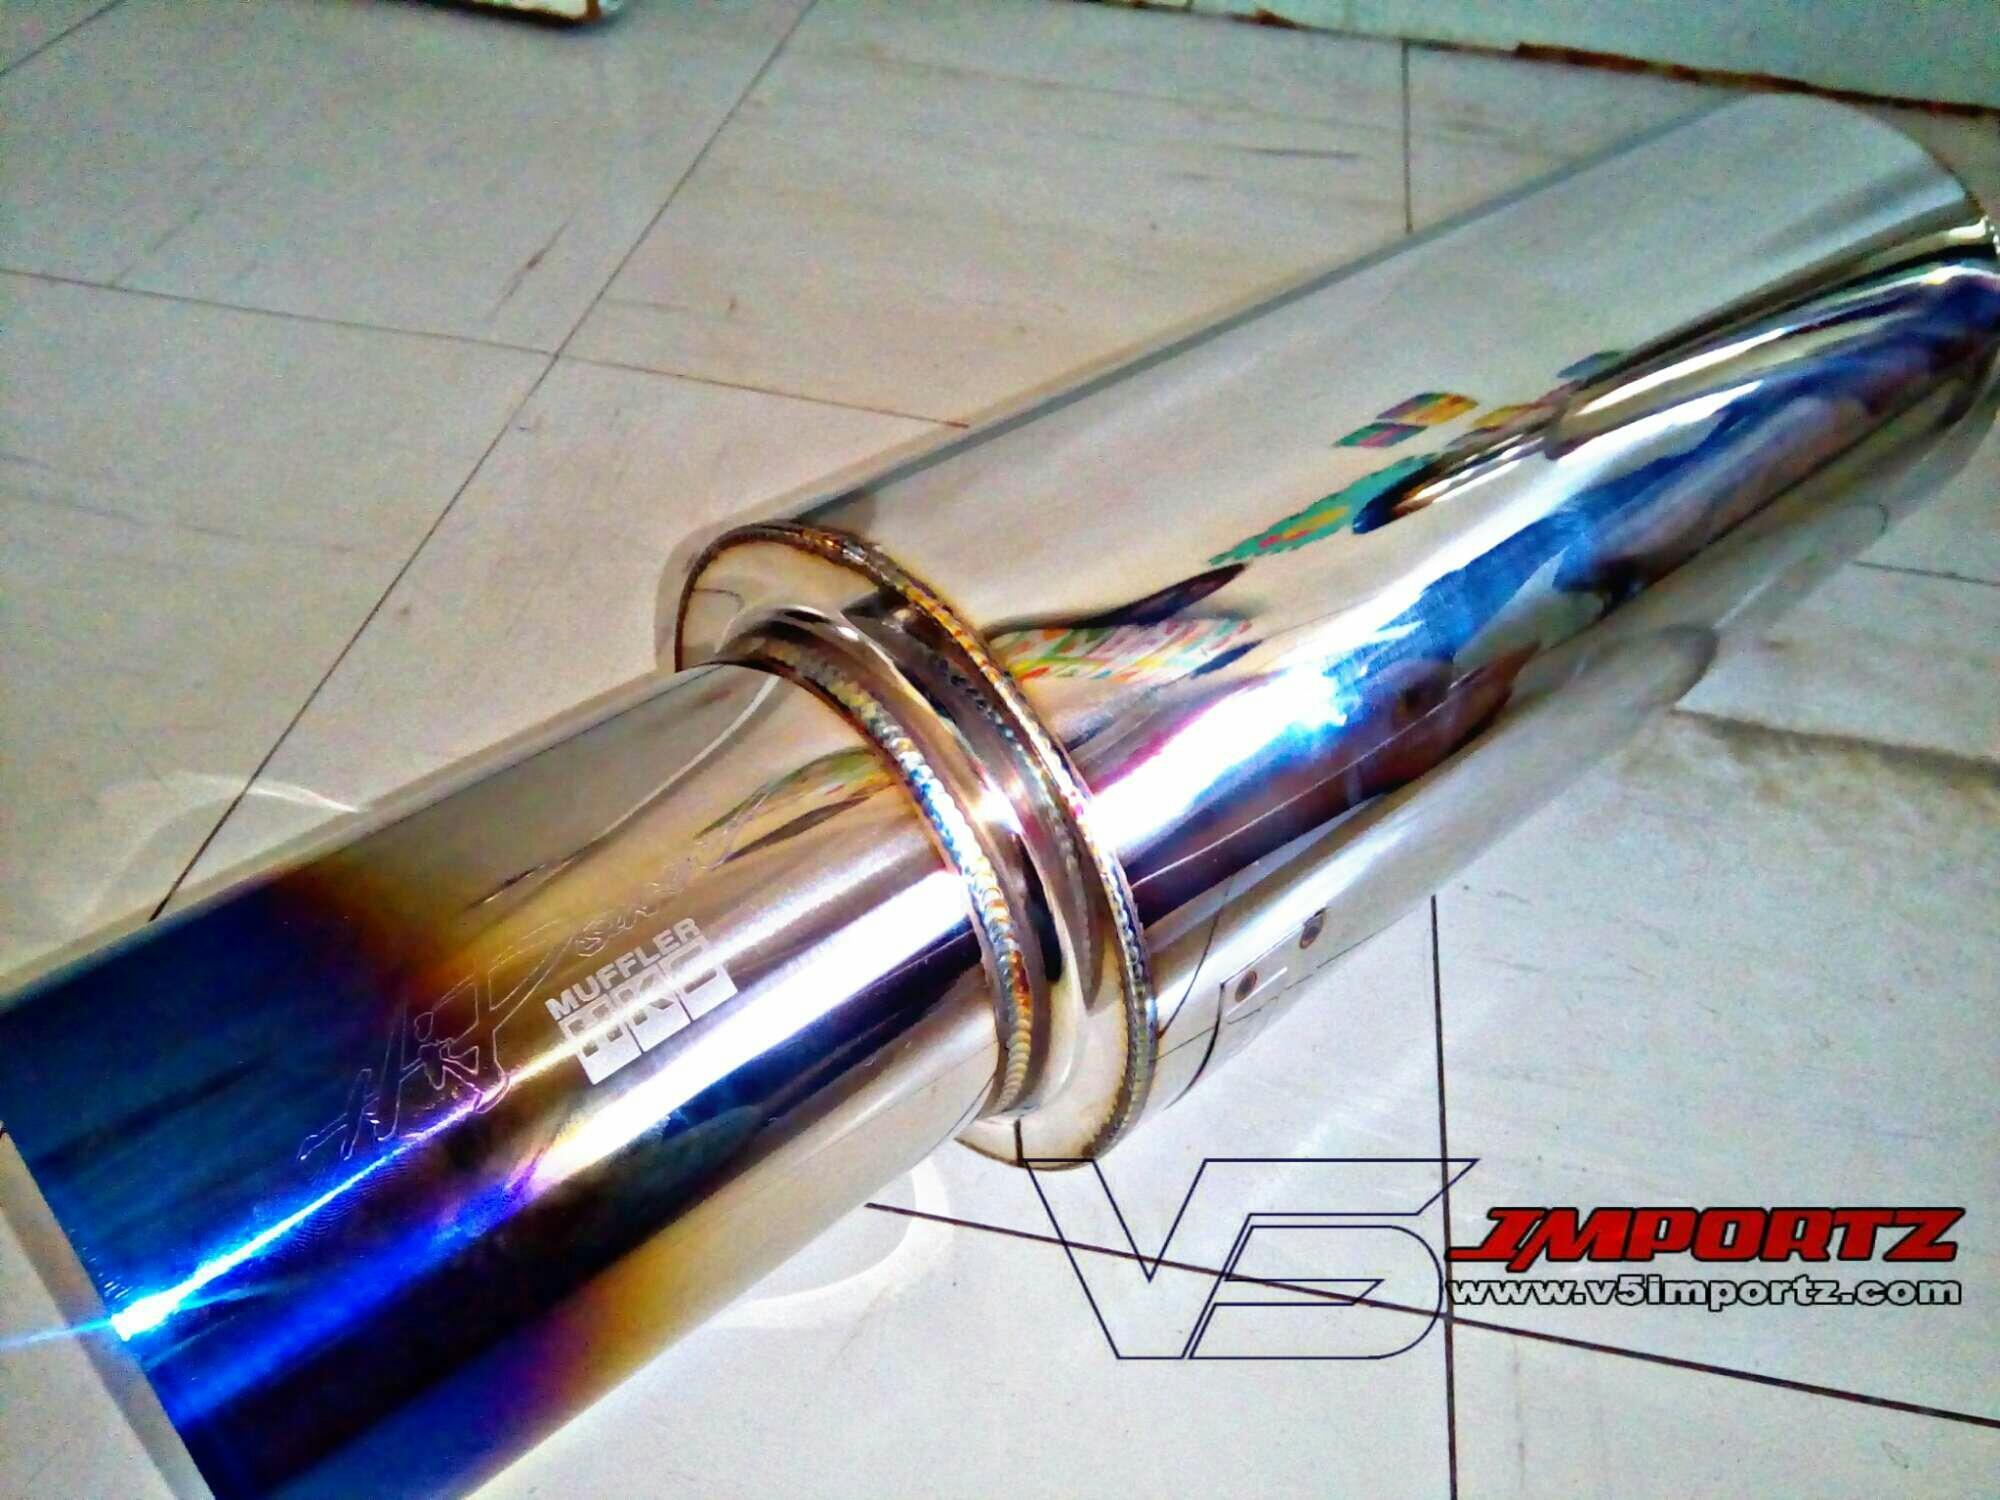 hight resolution of hks free flow hyper short small can burned tip v5importz